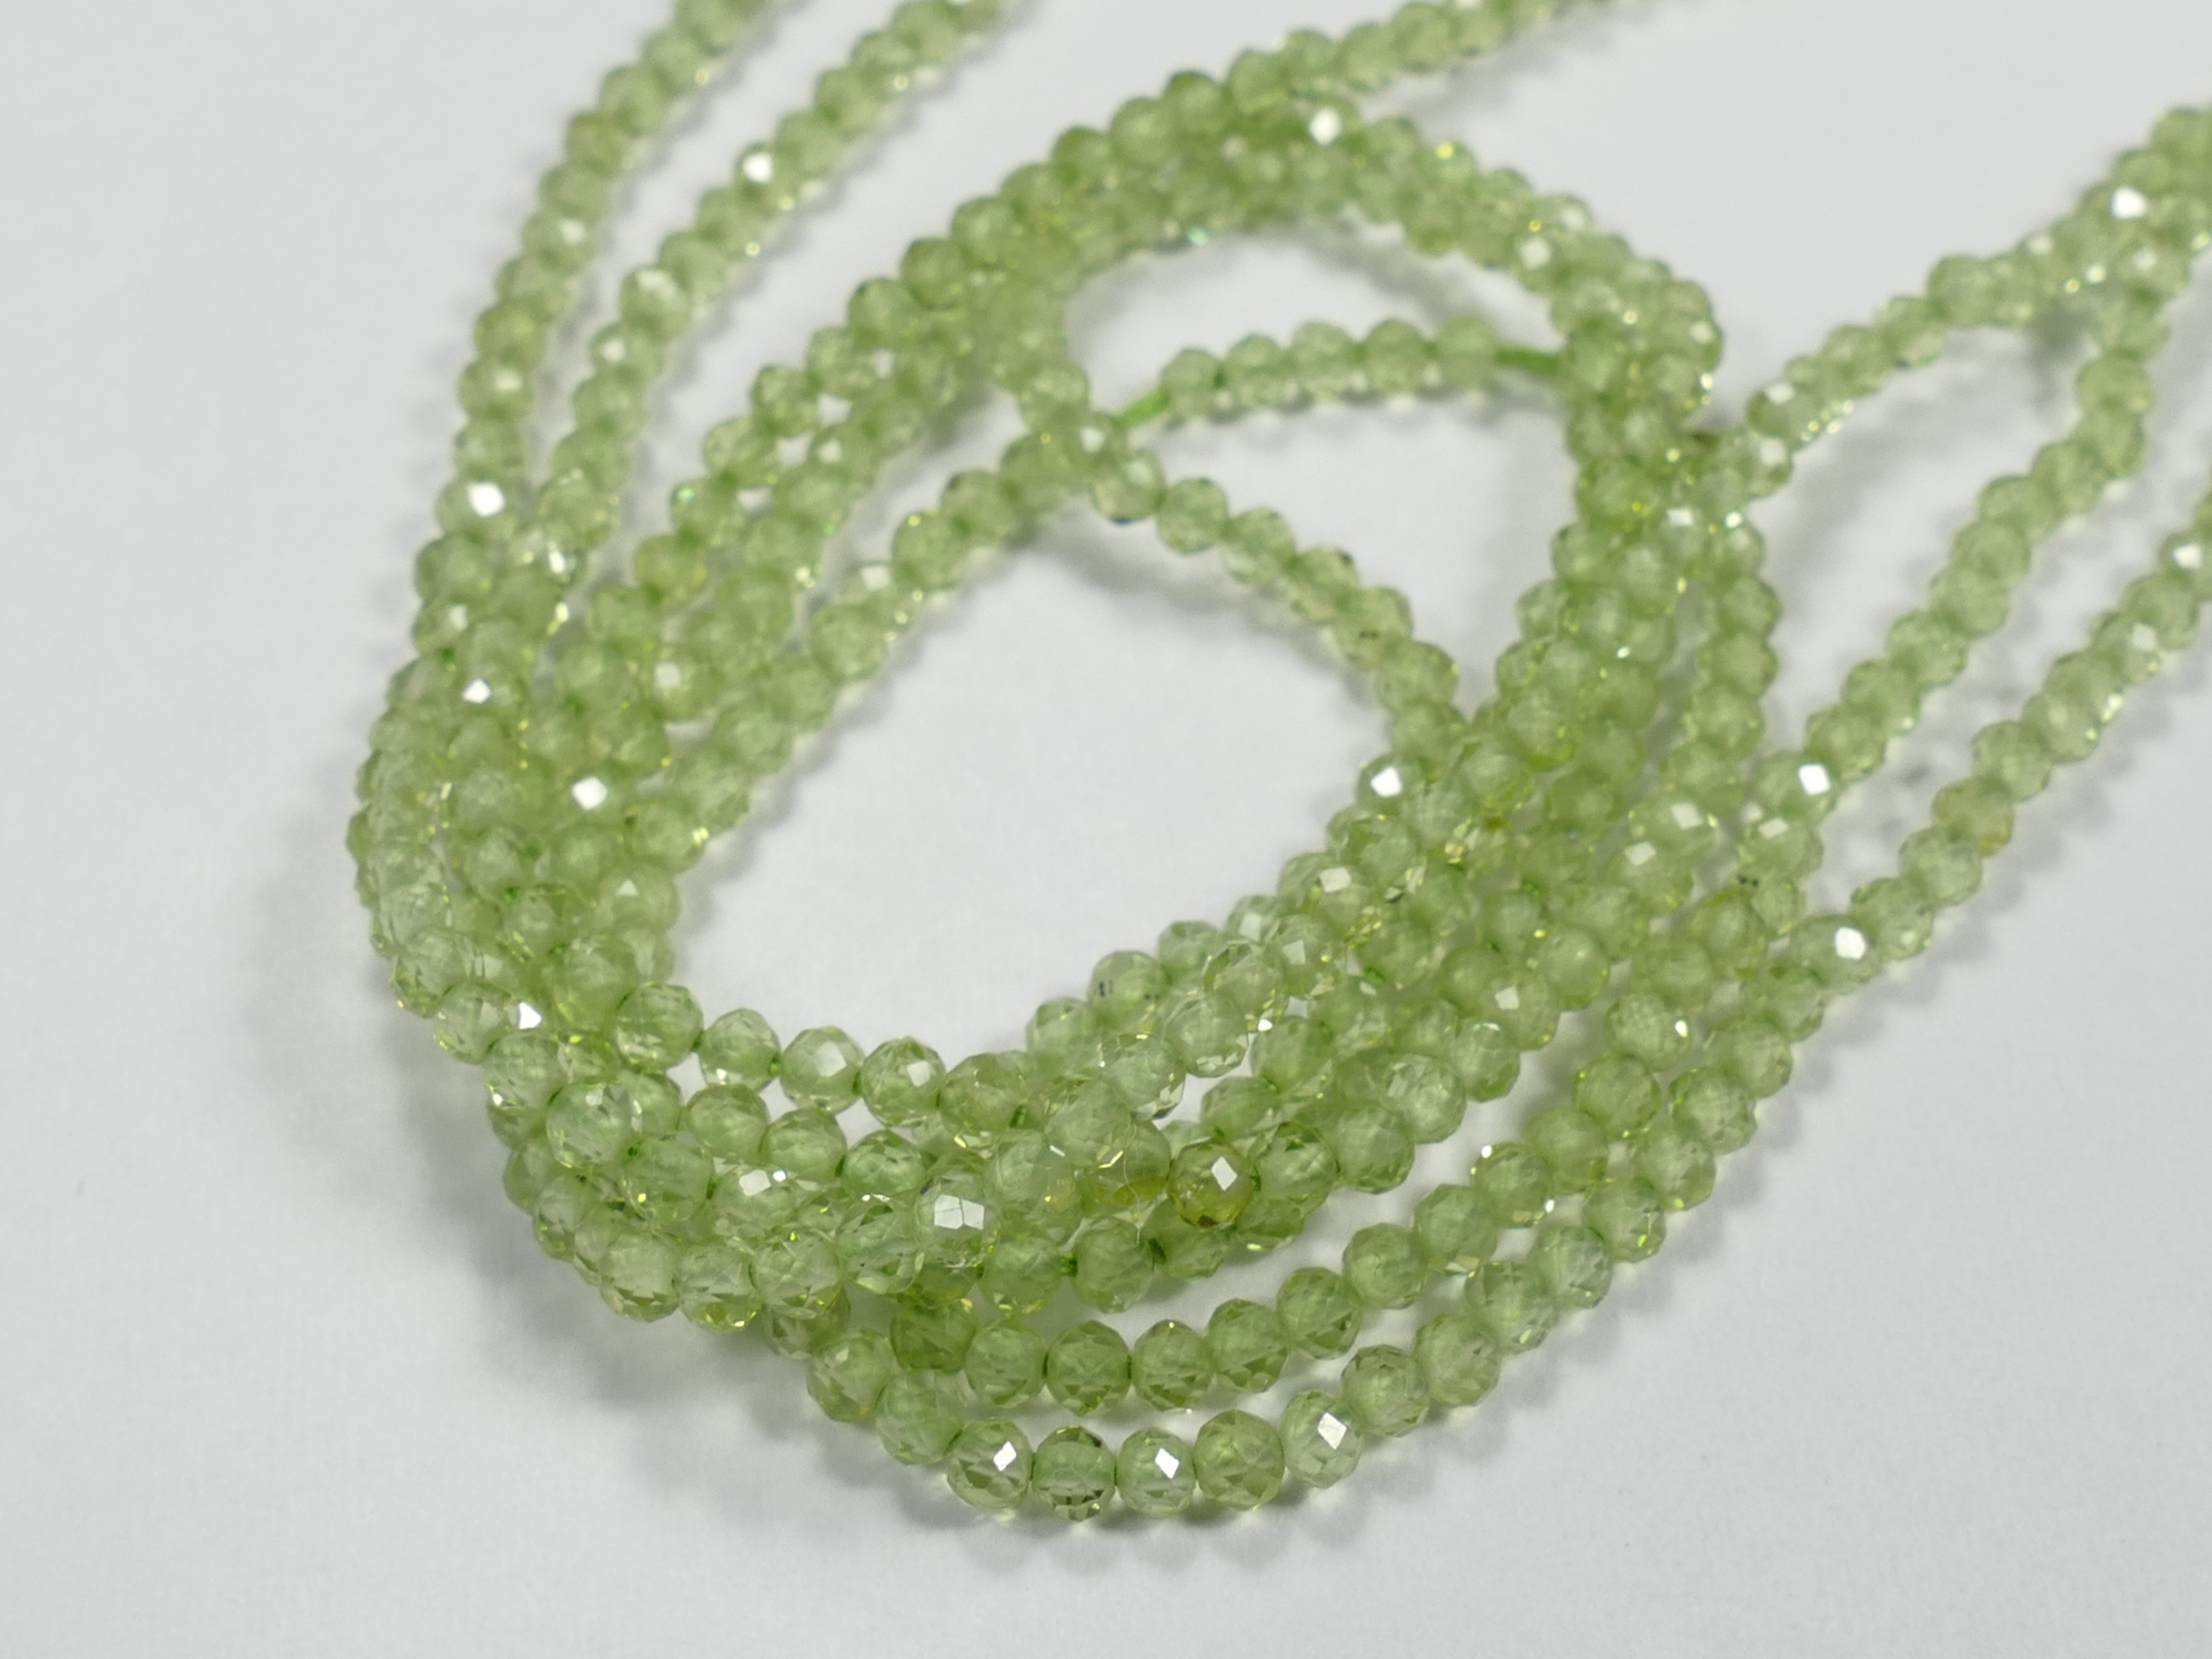 2.2mm AAA+ Petite perle de Péridot naturel x16cm (6.3inch) rondelle micro facettée (#AC906)